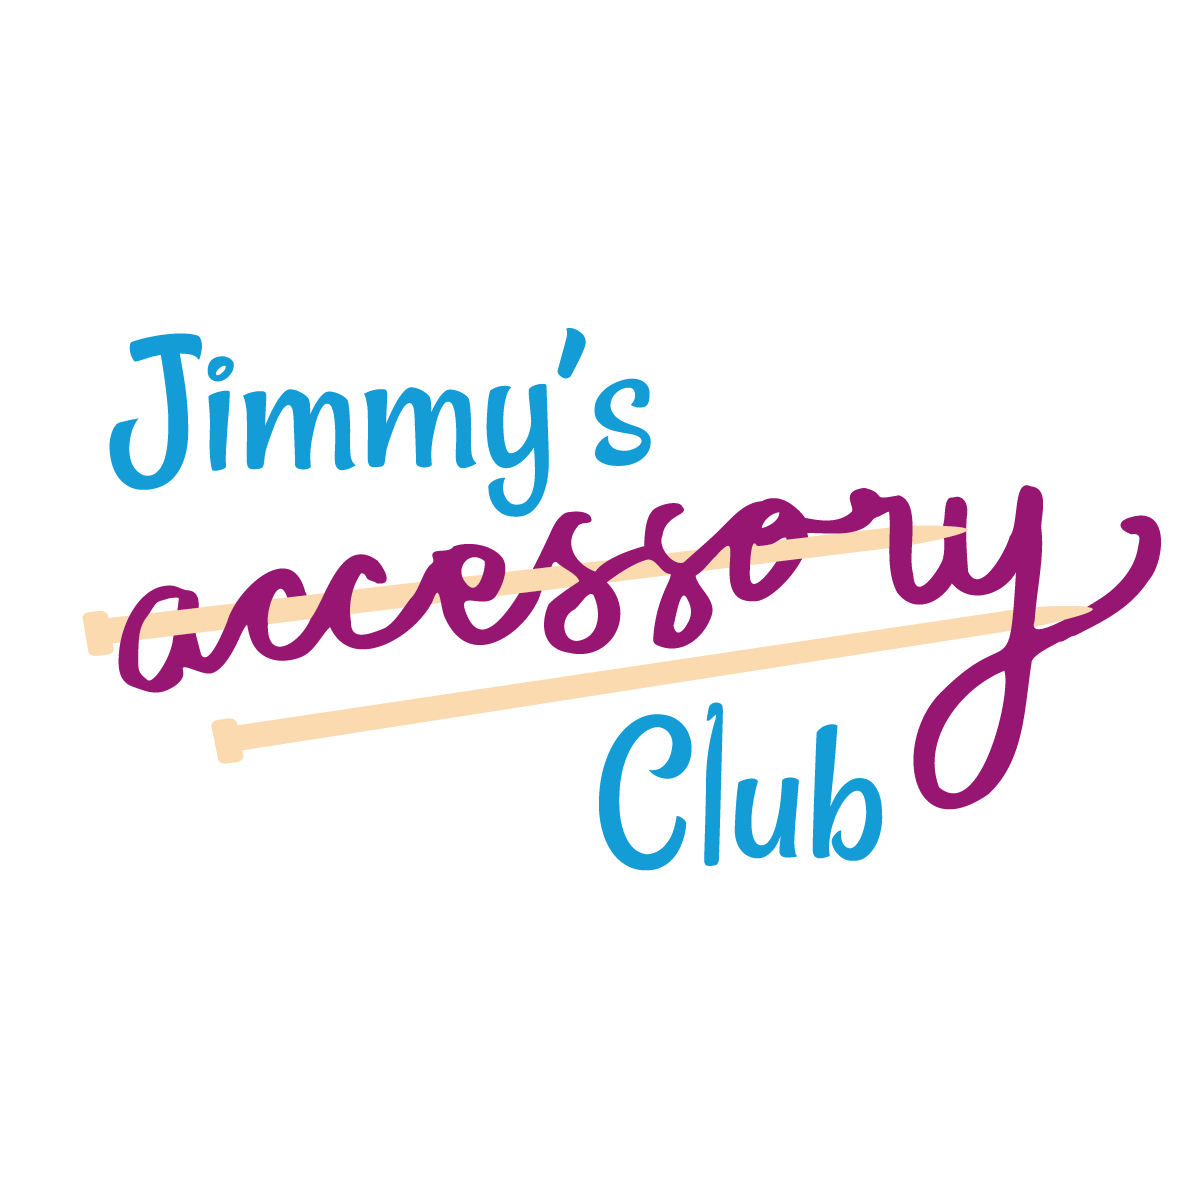 Jimmy's Accessory Club